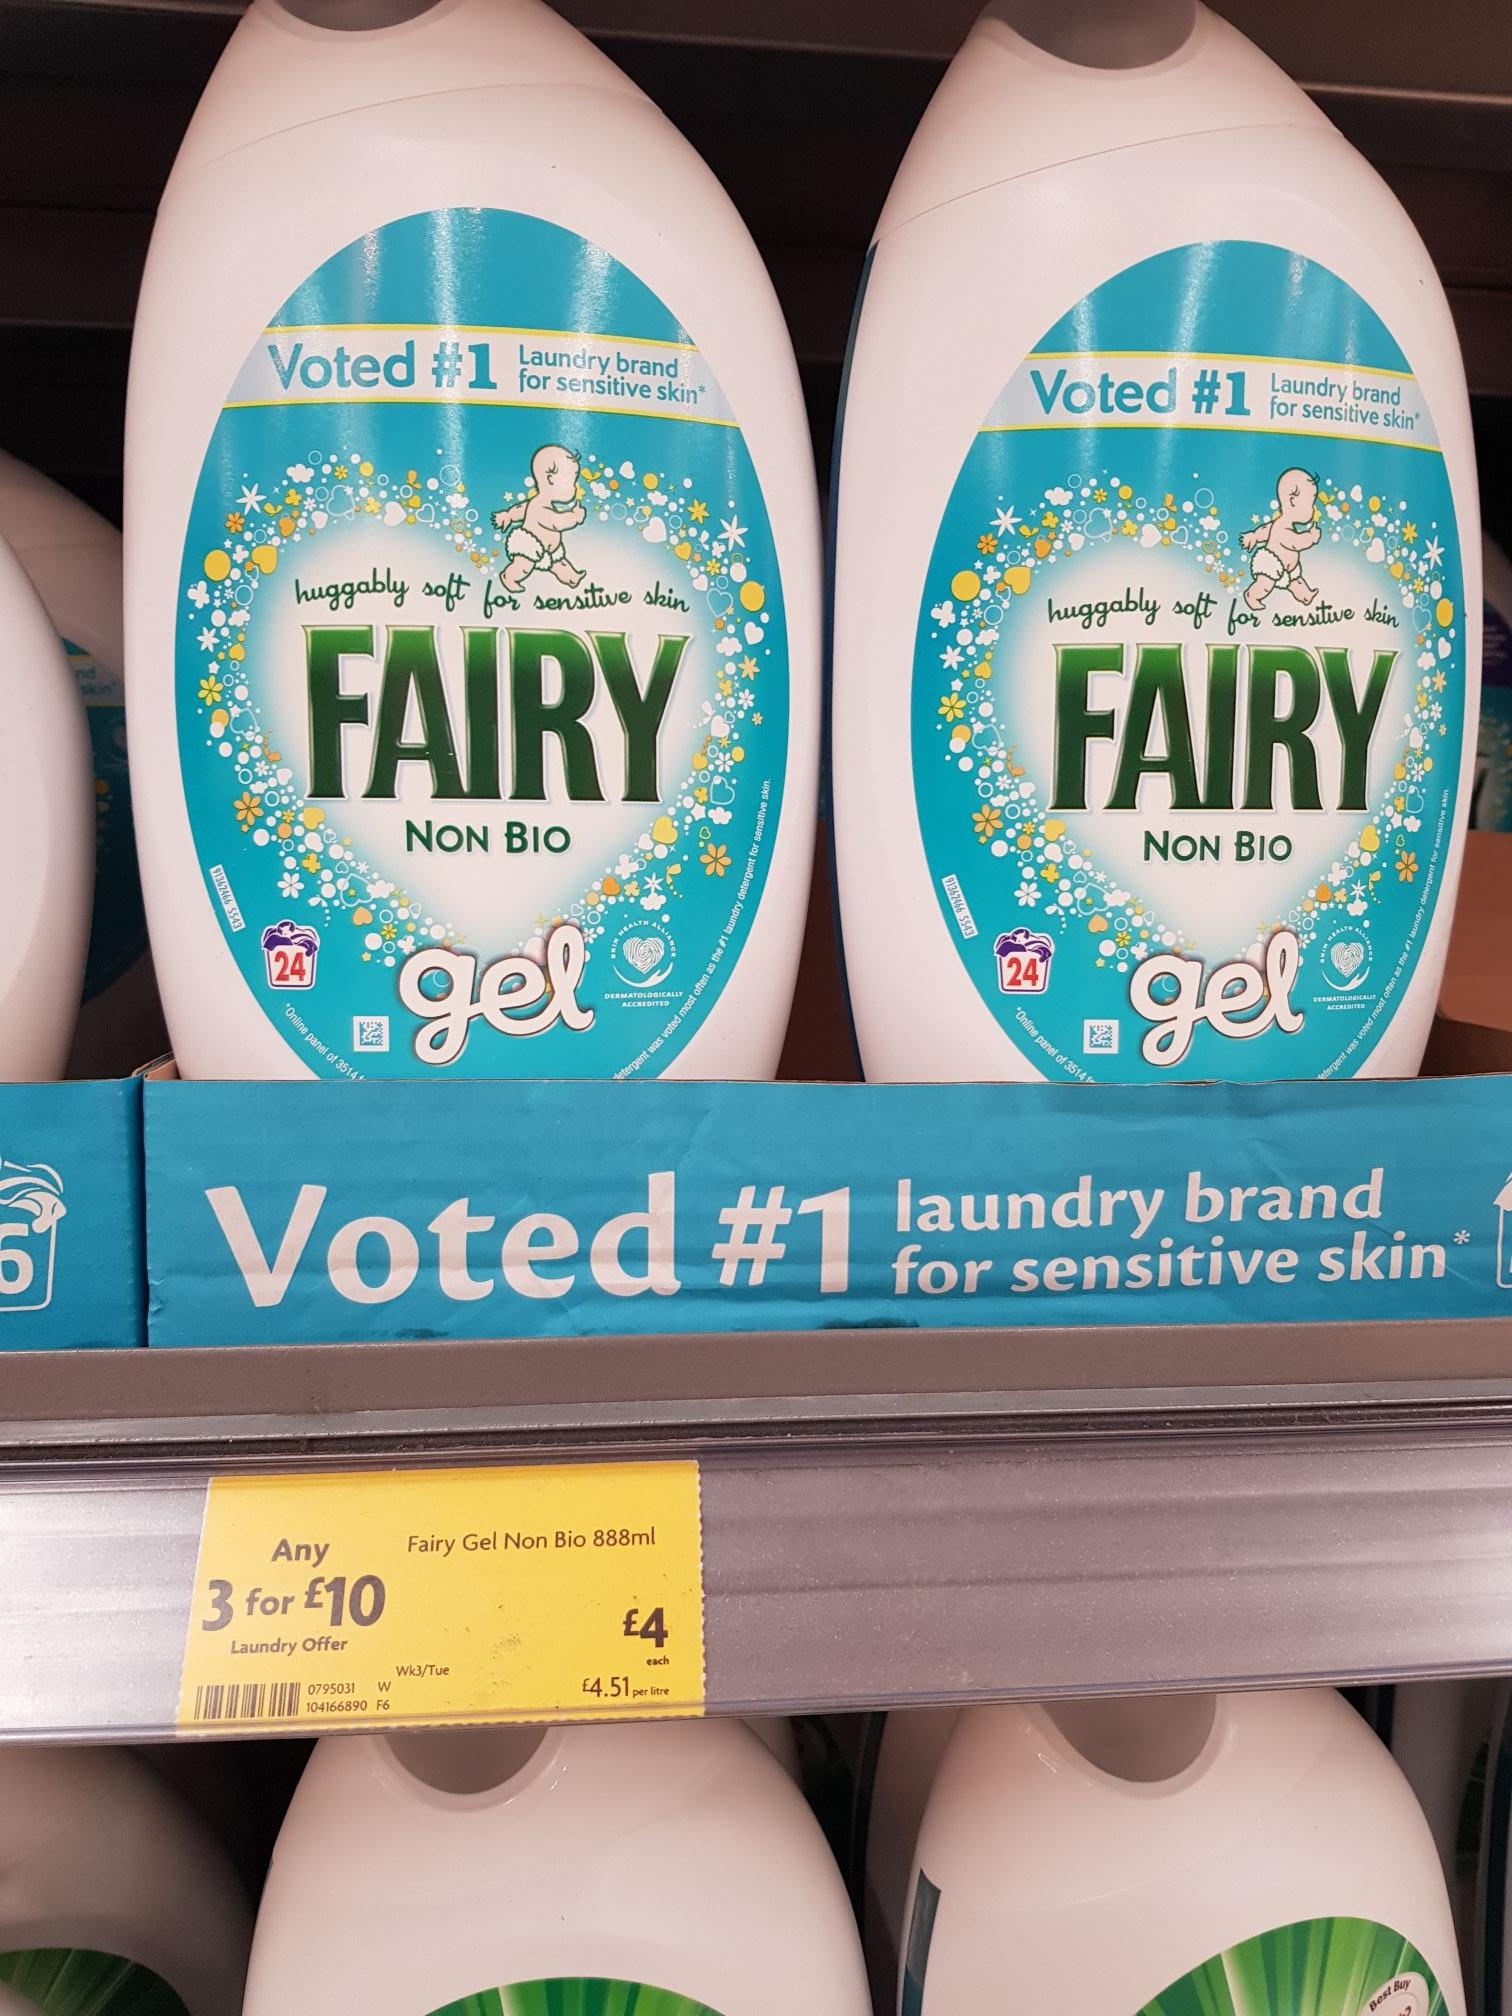 3 for £10 fairy washing liquid 888ml @ Morrisons